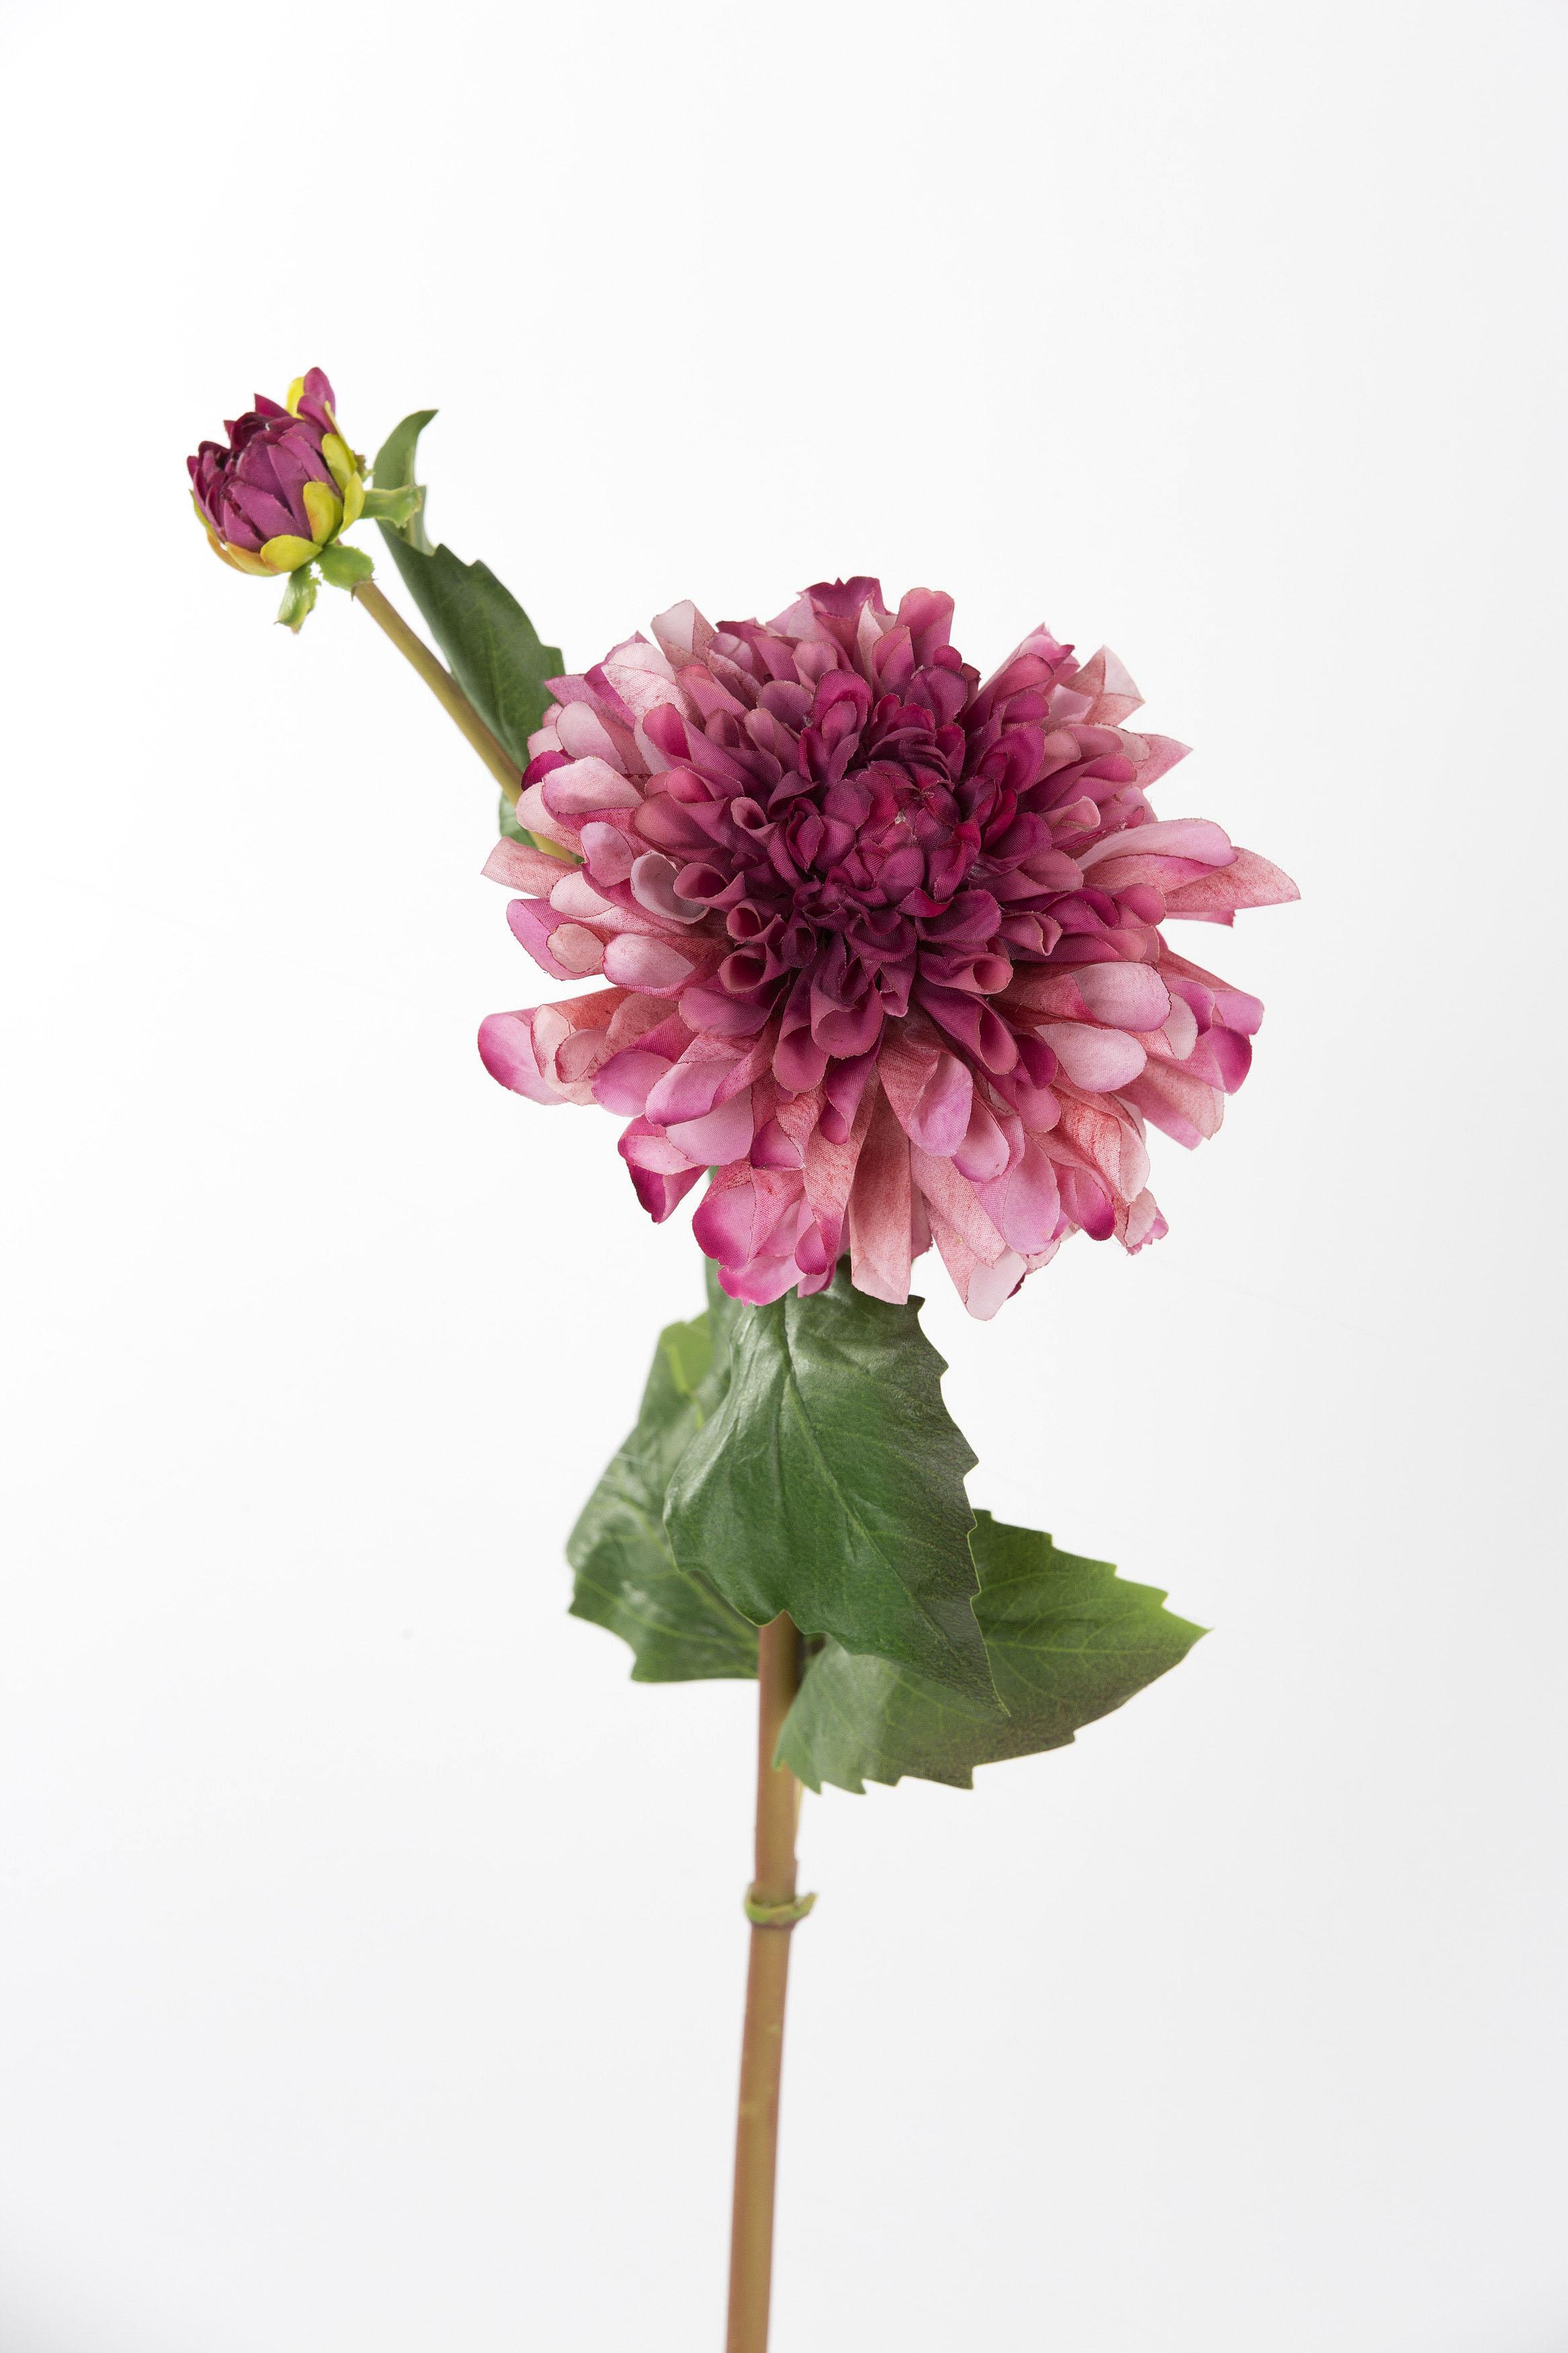 Faux Dahlia Flower Stem Burgundy - Shop